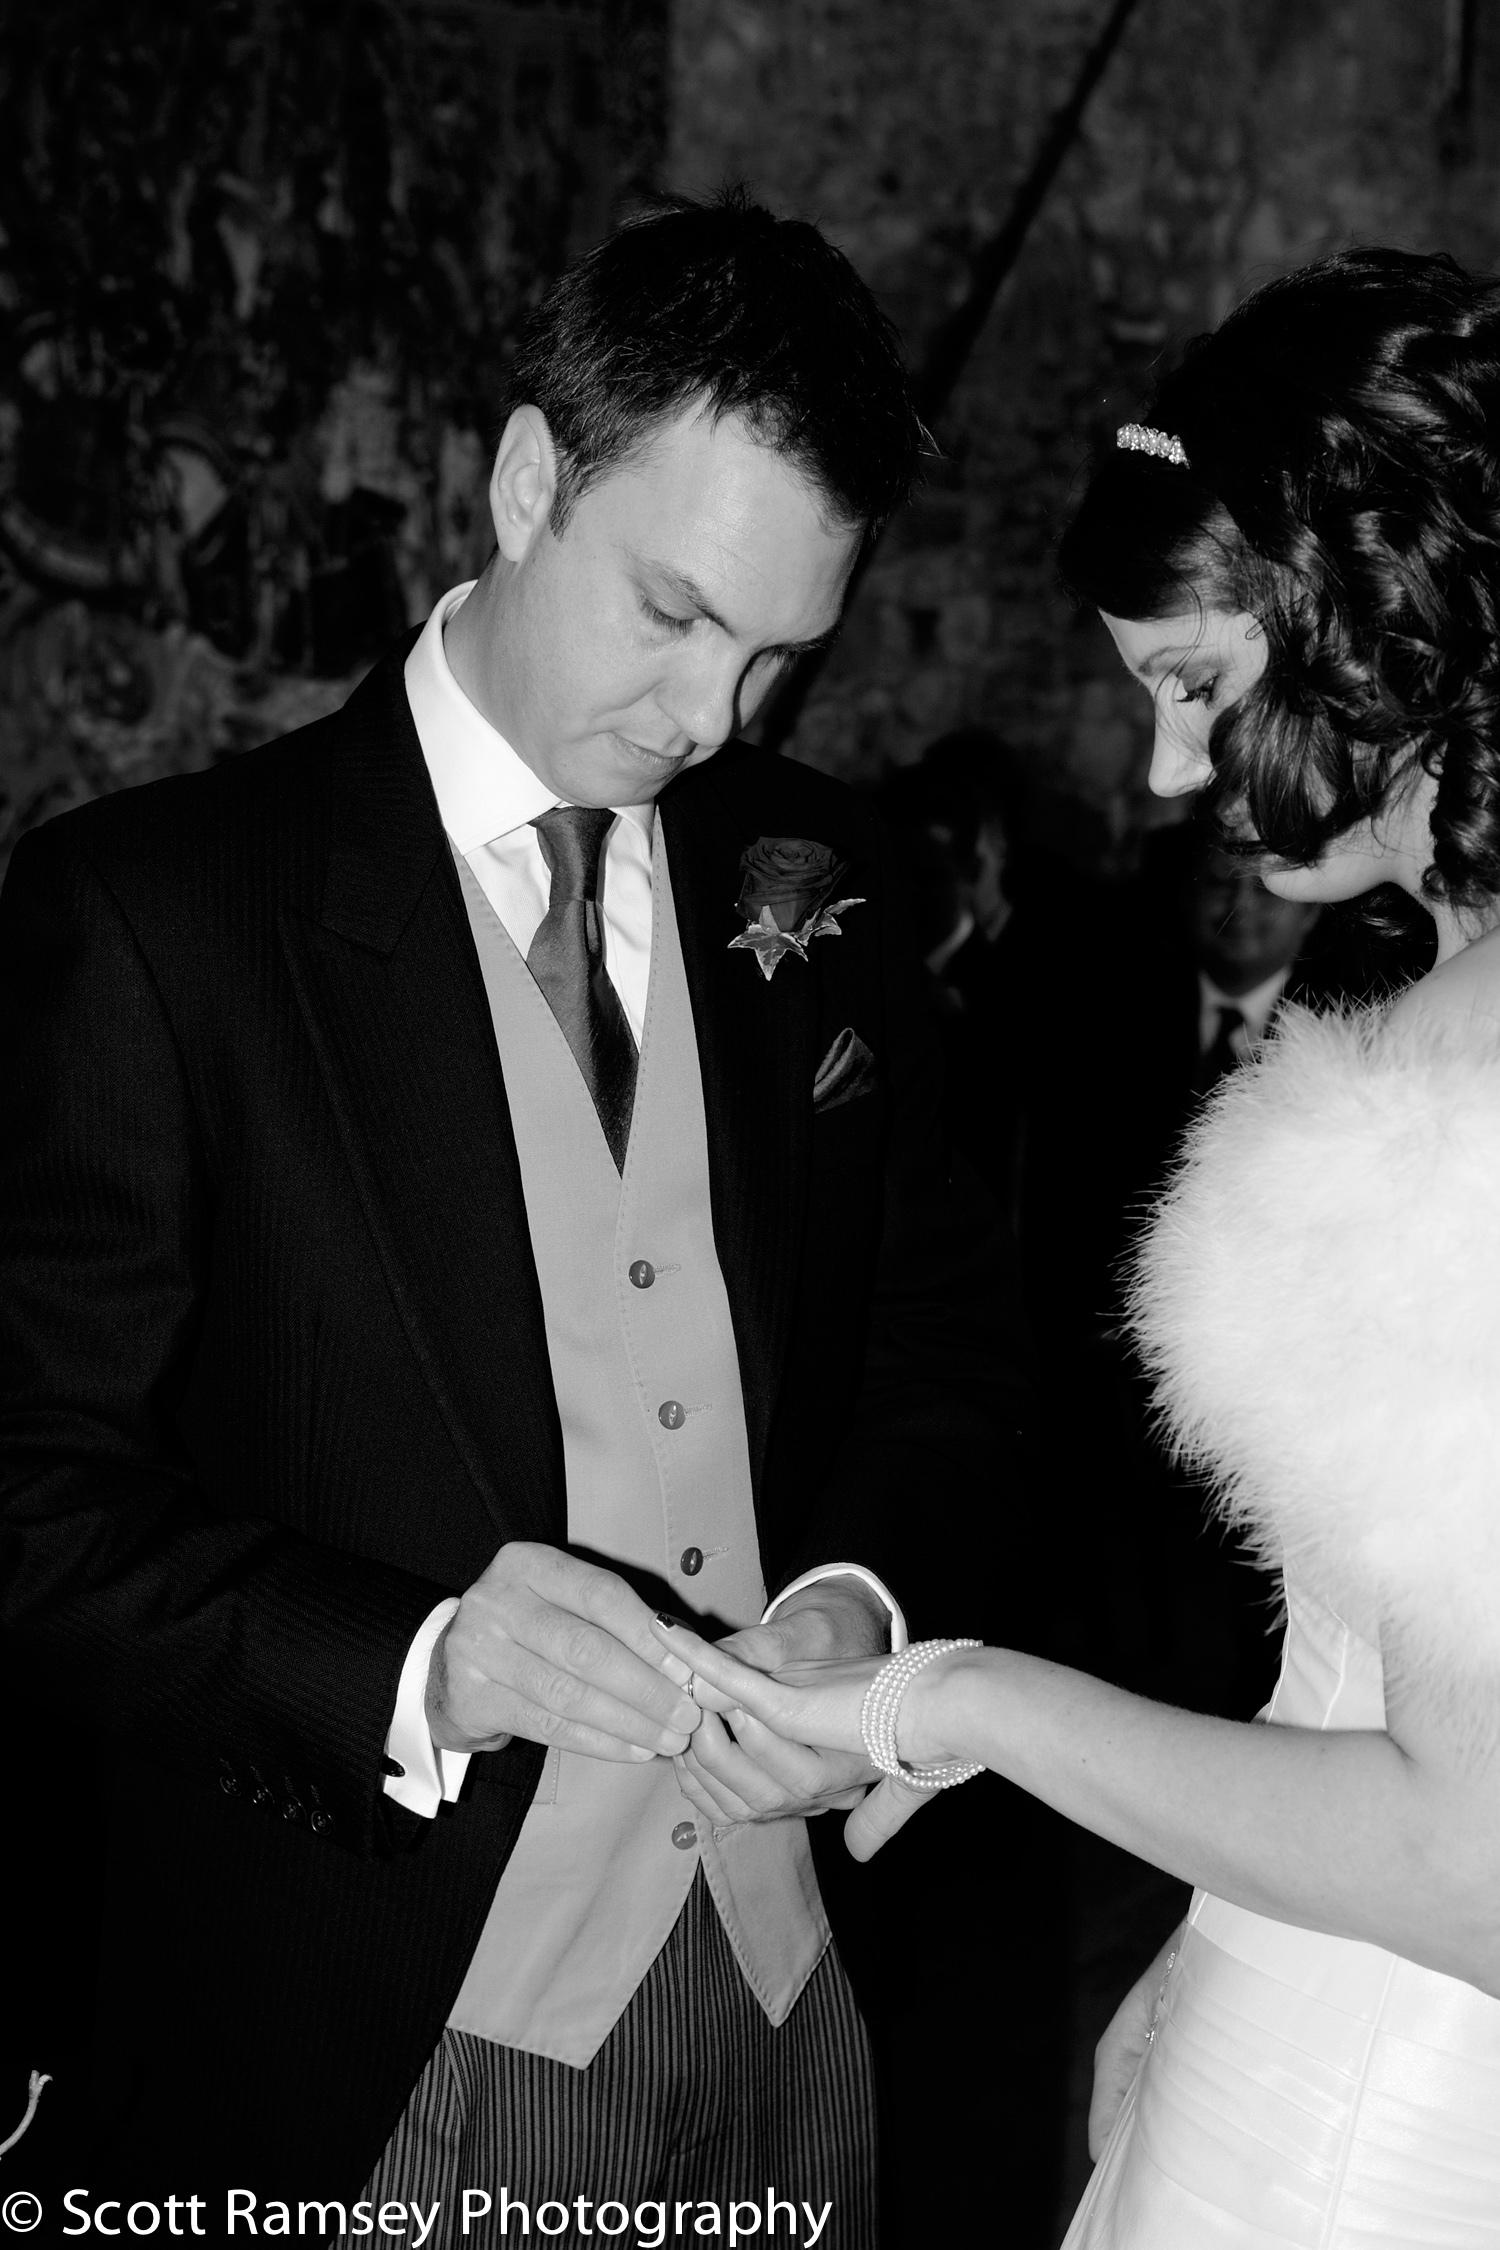 Winter-Wedding-Spread-Eagle-Hotel-Midhurst-Groom-Puts-Ring-On-Br